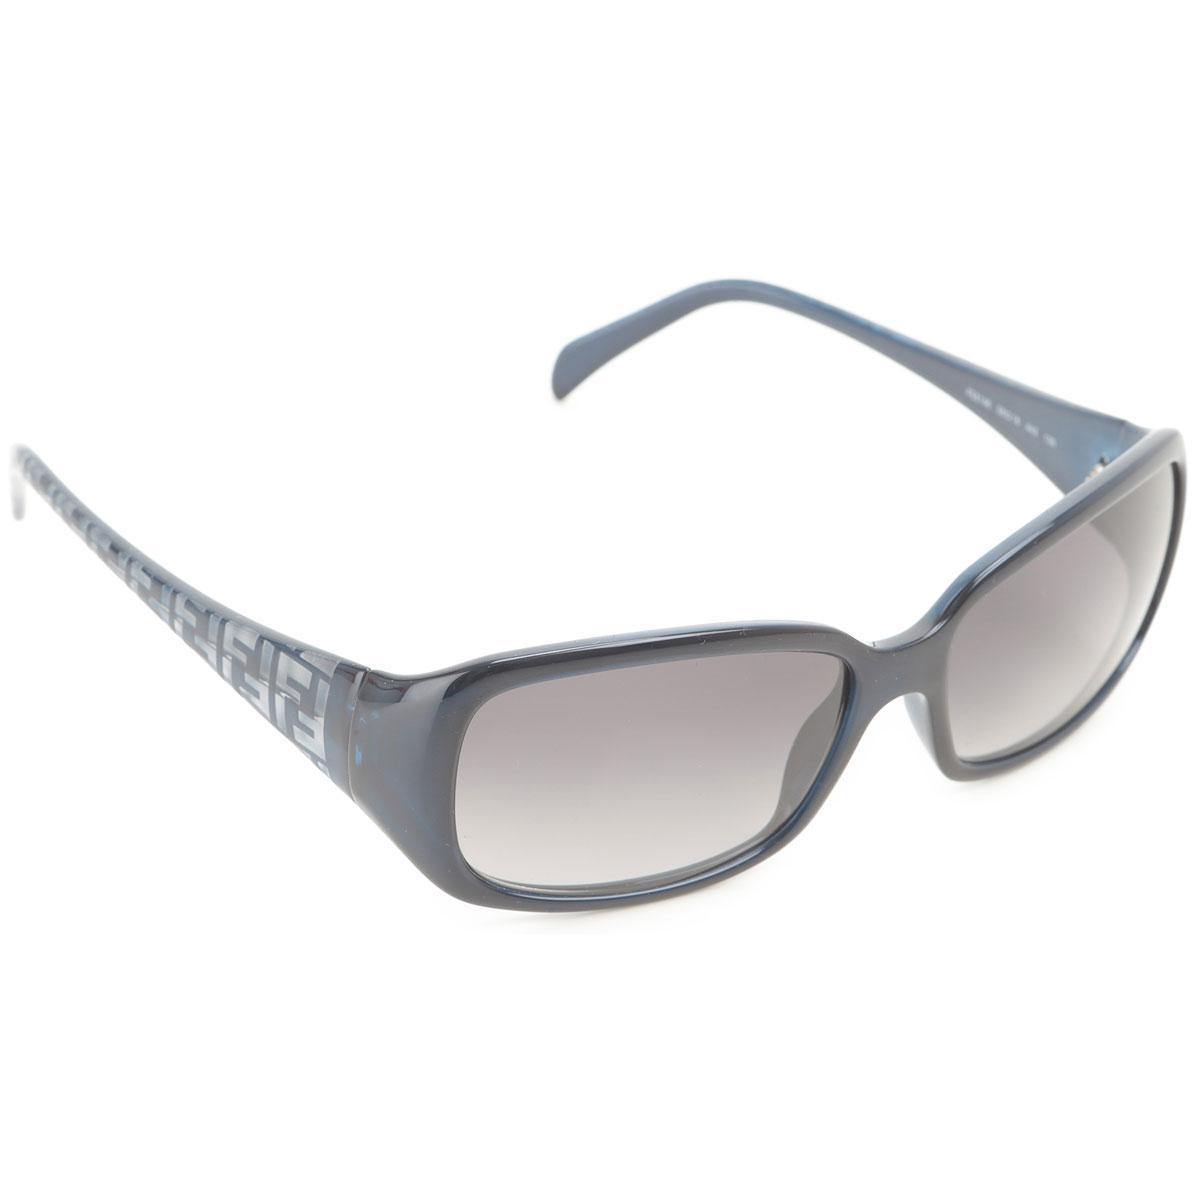 bc08ea9bca Lyst - Fendi Sunglasses